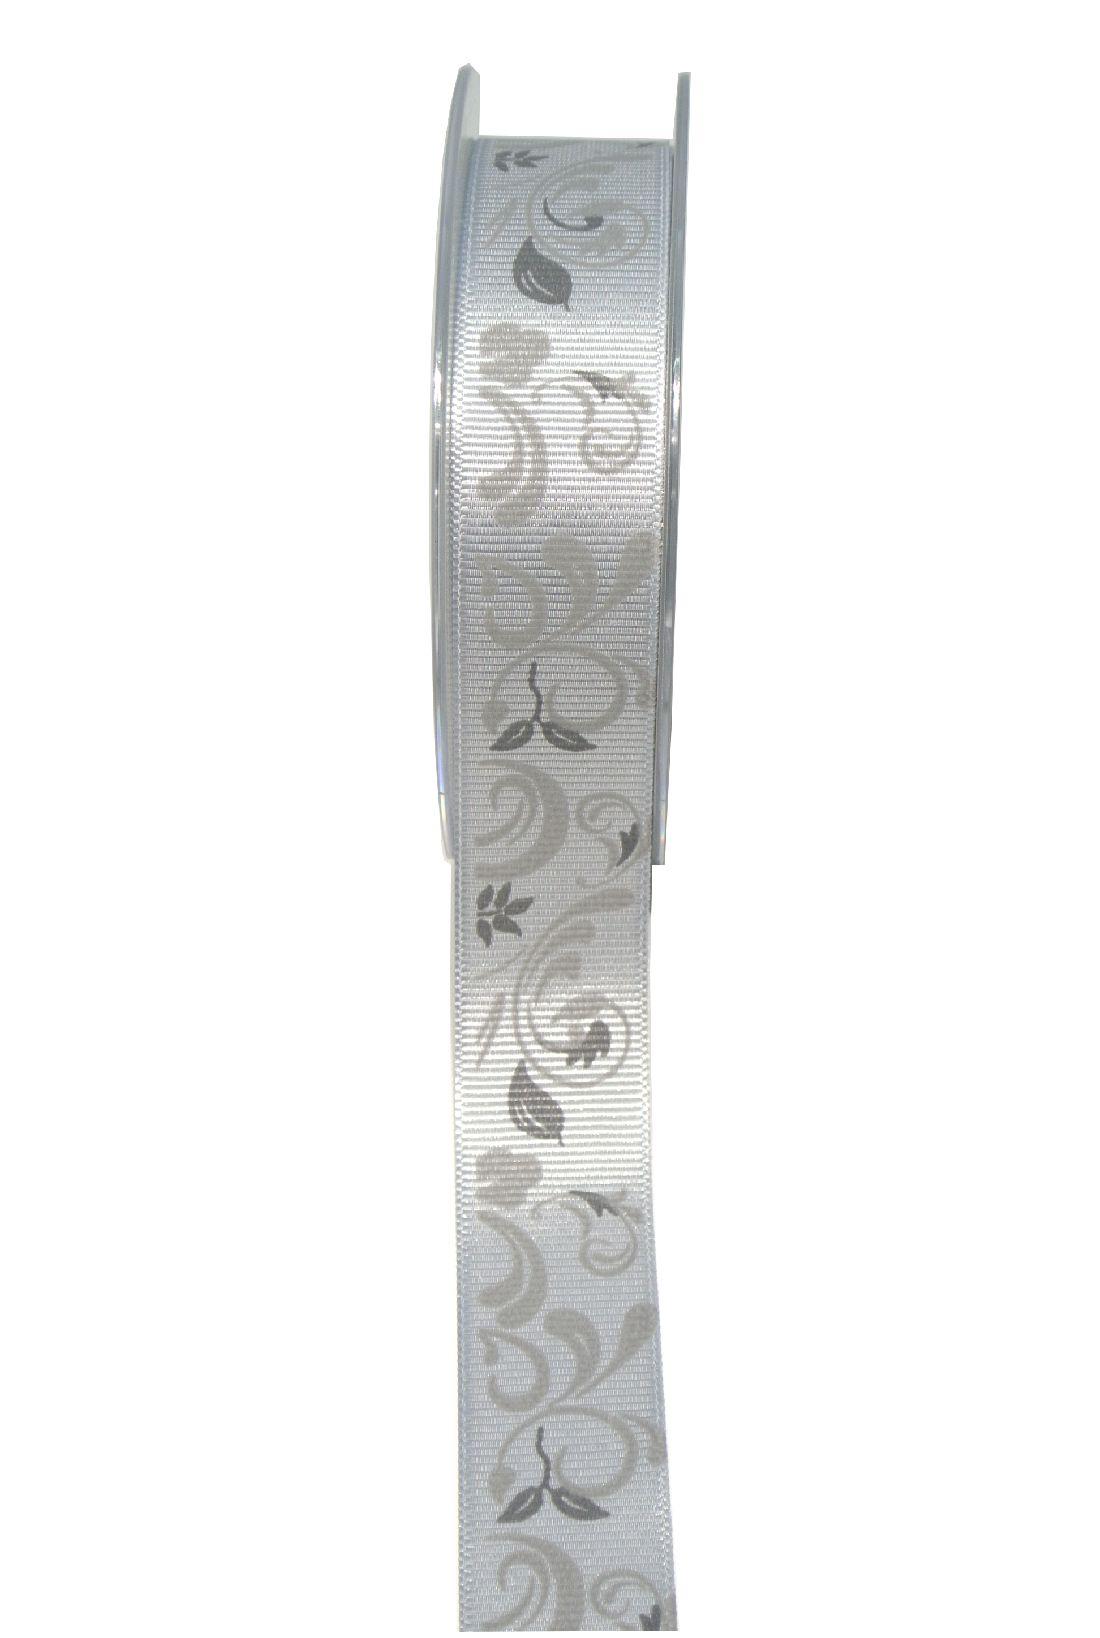 Trauerranke-Rips SCHWARZ 100325 25mm 20m